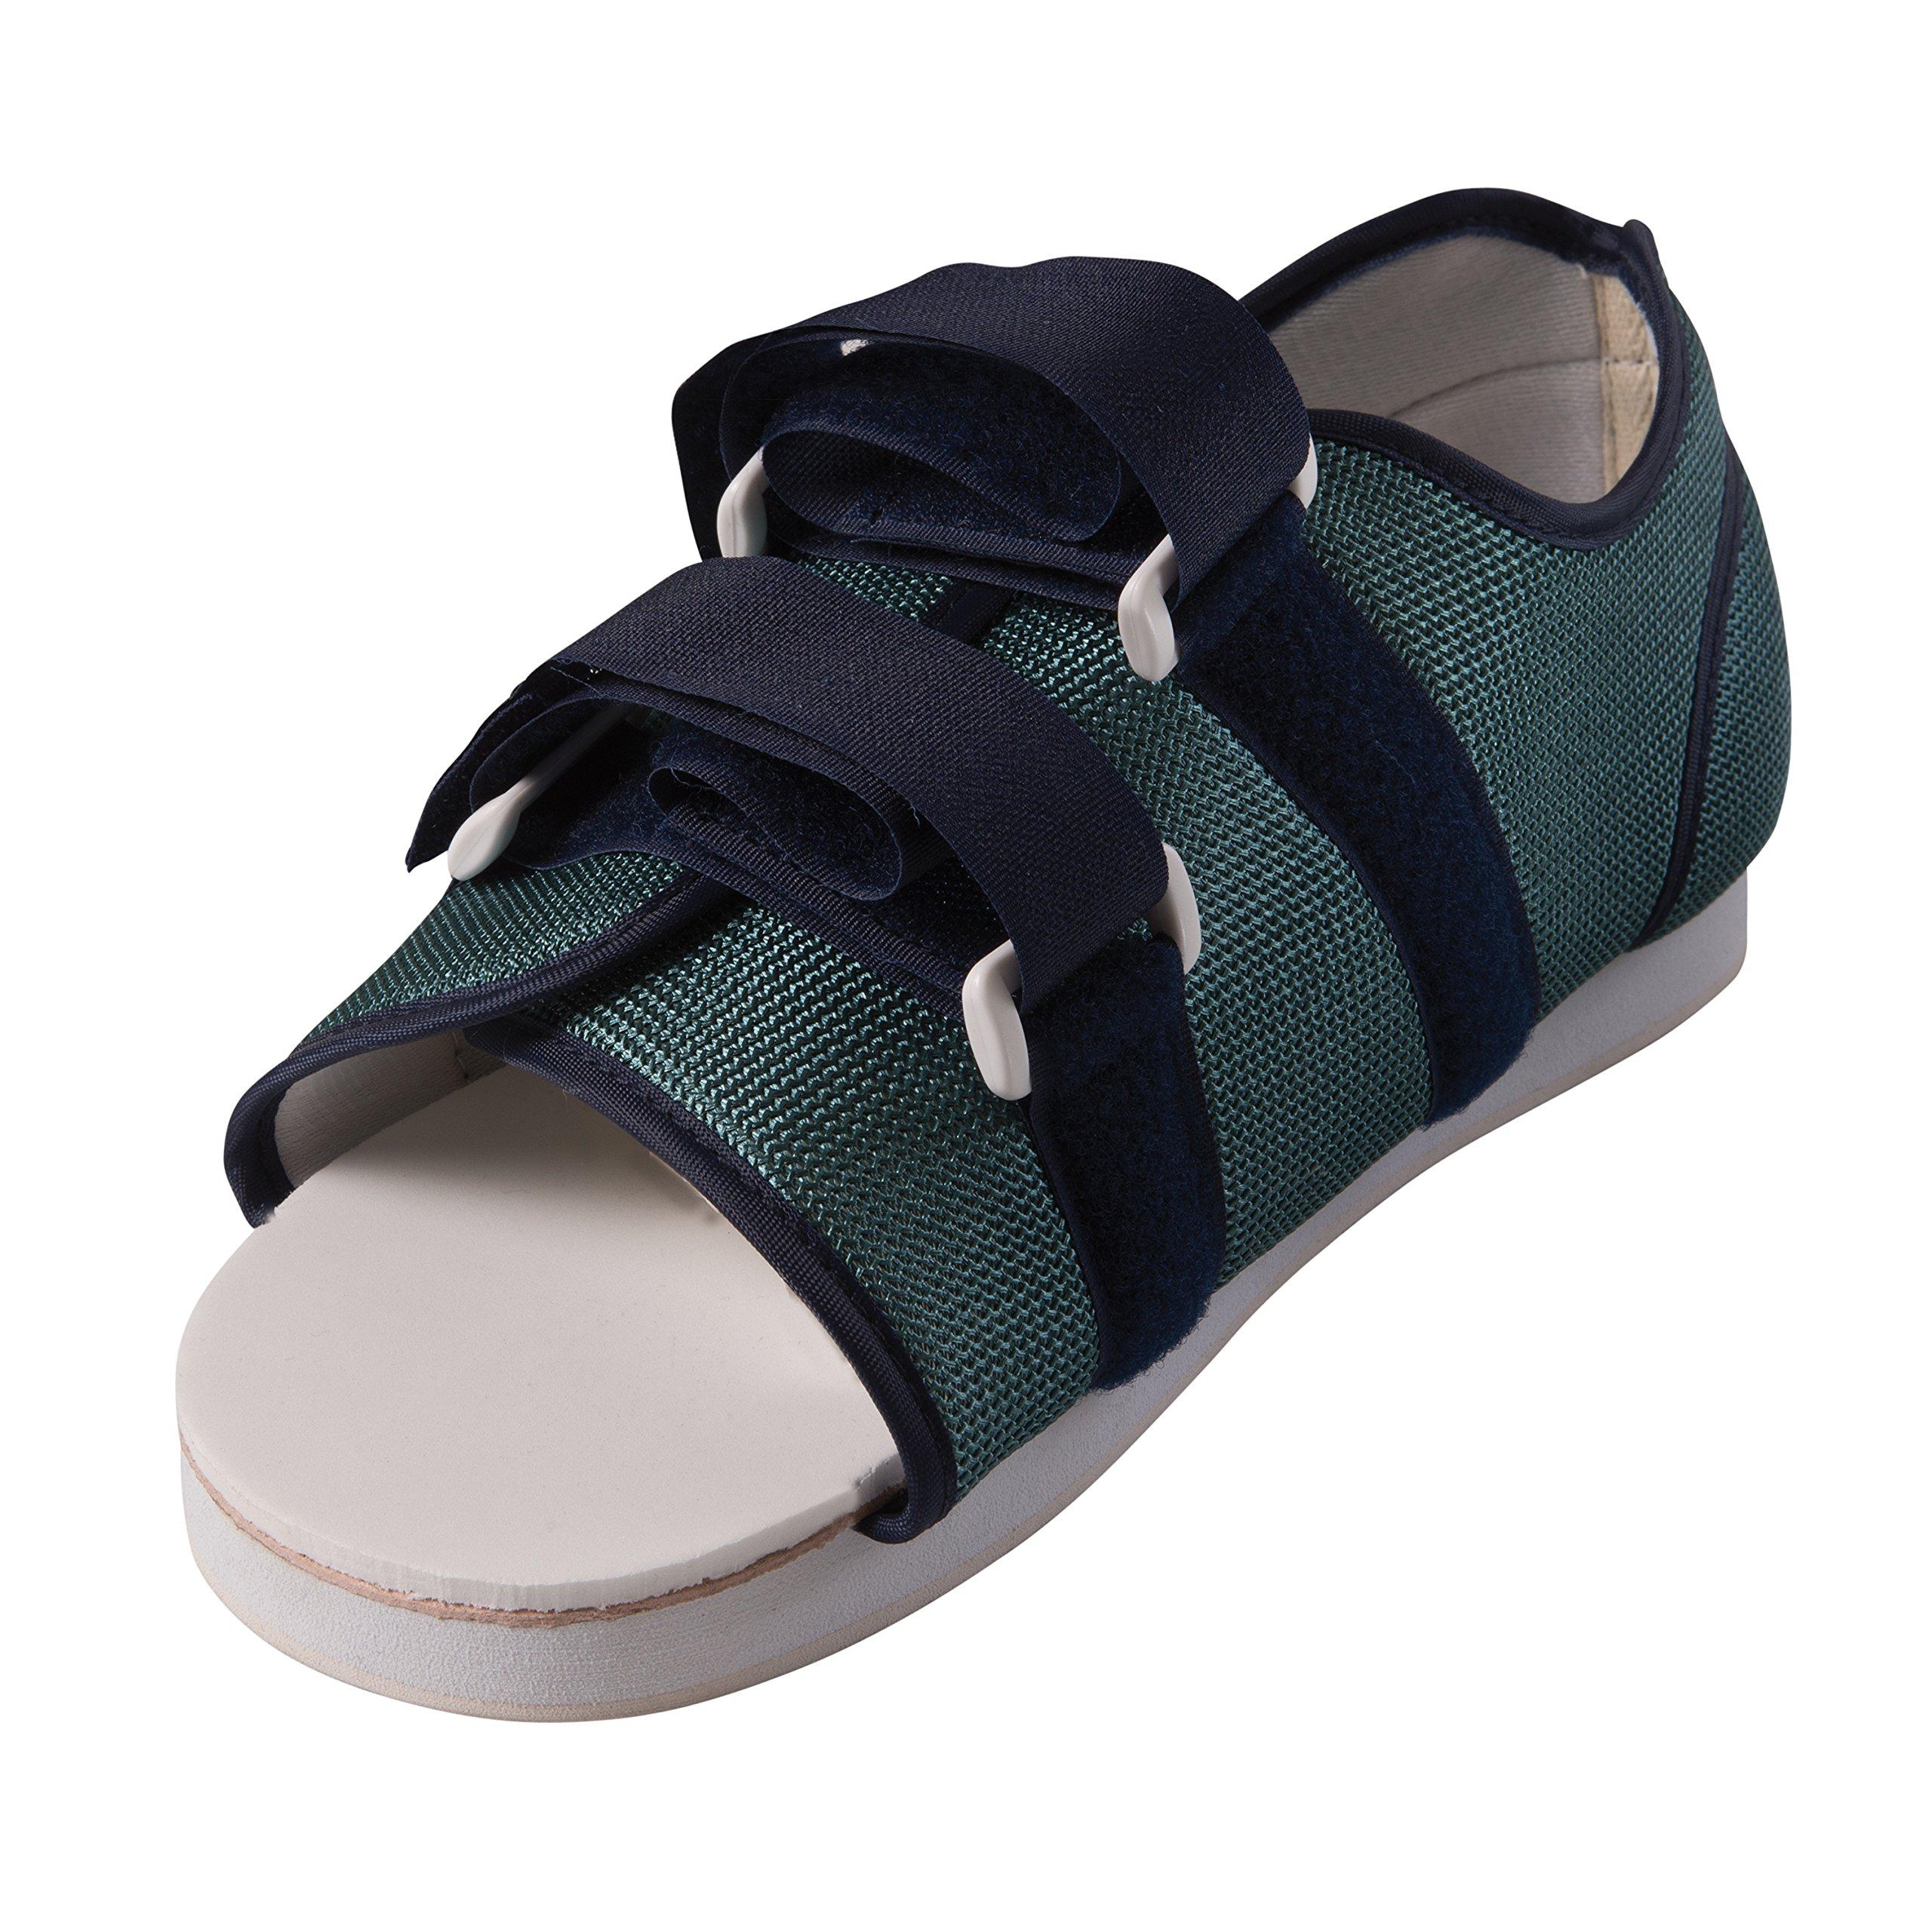 MABIS DMI Healthcare Mesh Post-Op Cast Shoe, Lightweight Shoe with Adjustable Straps for Custom Fit, Men's Medium,9-11, Blue